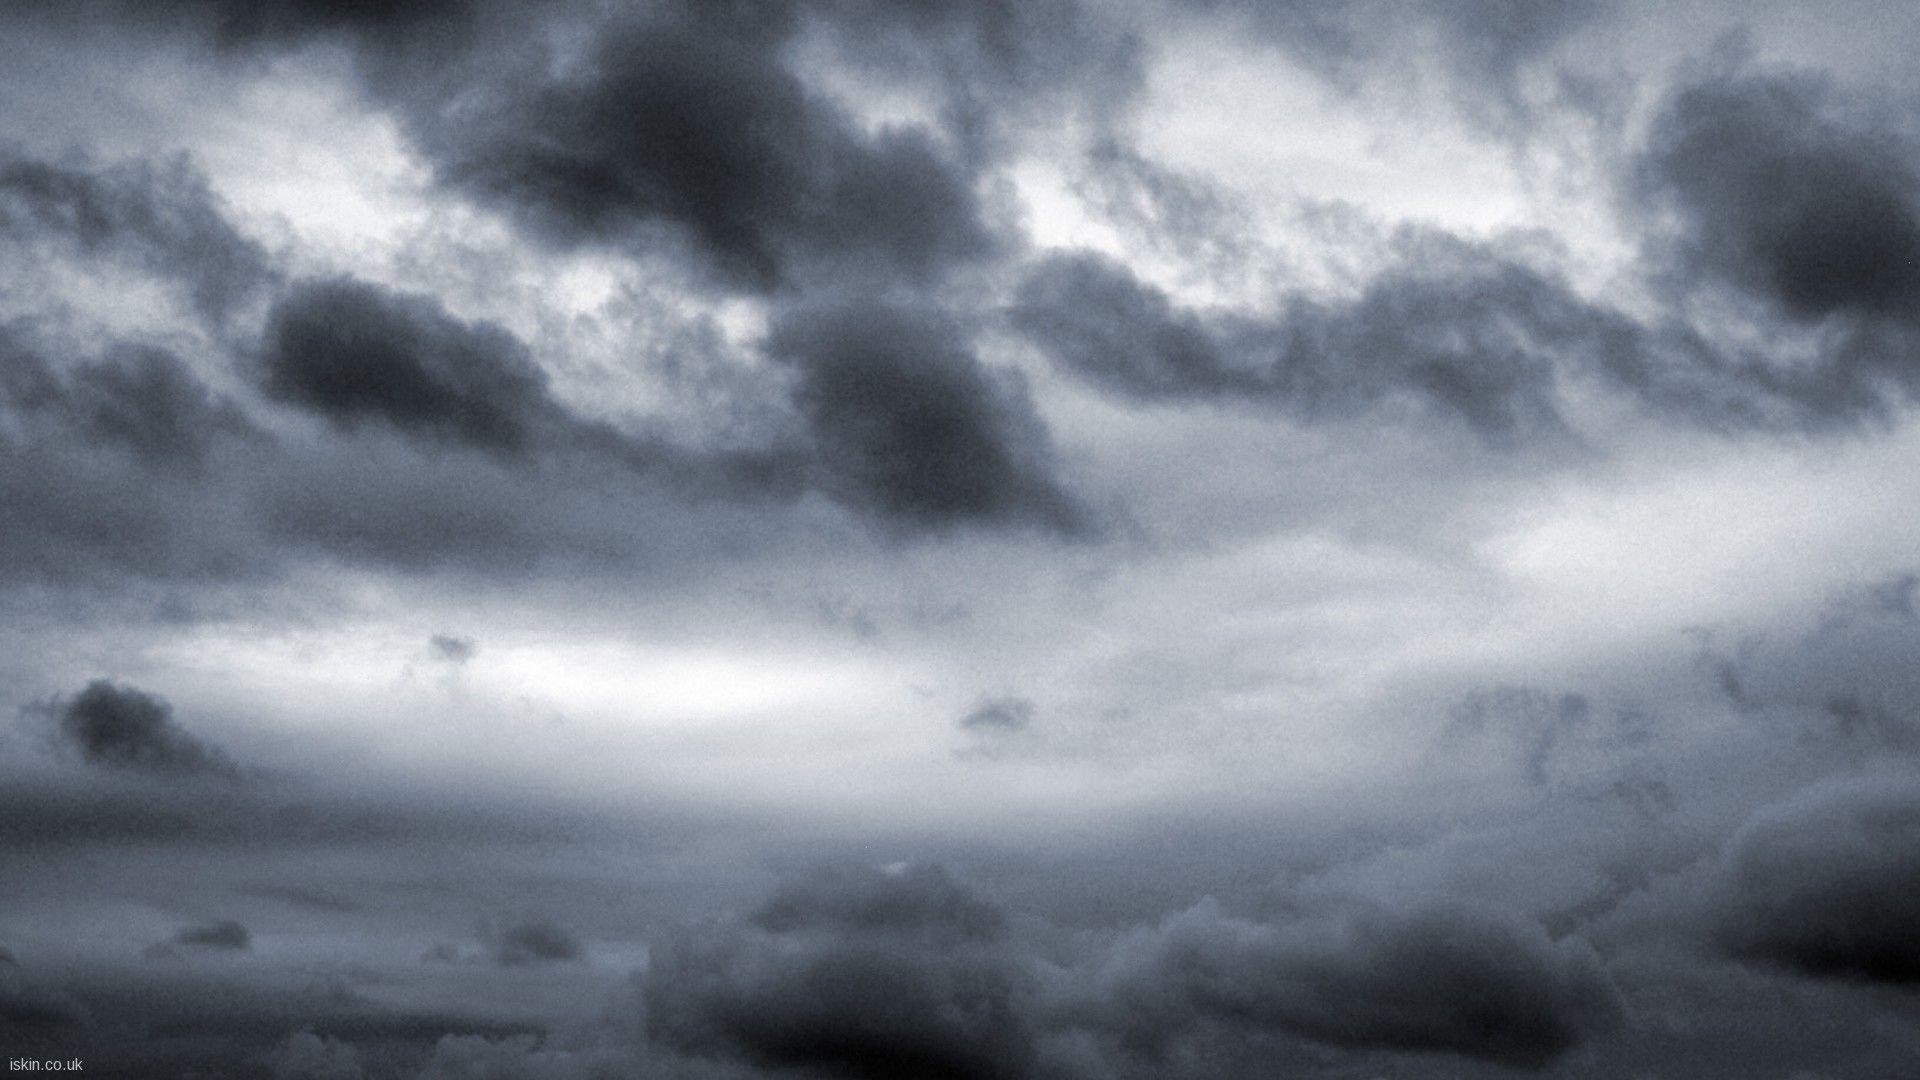 gray cloudy sky wallpaper – photo #4. Just Mah Jongg Solitaire Play Mah  Jongg Solitaire For Free